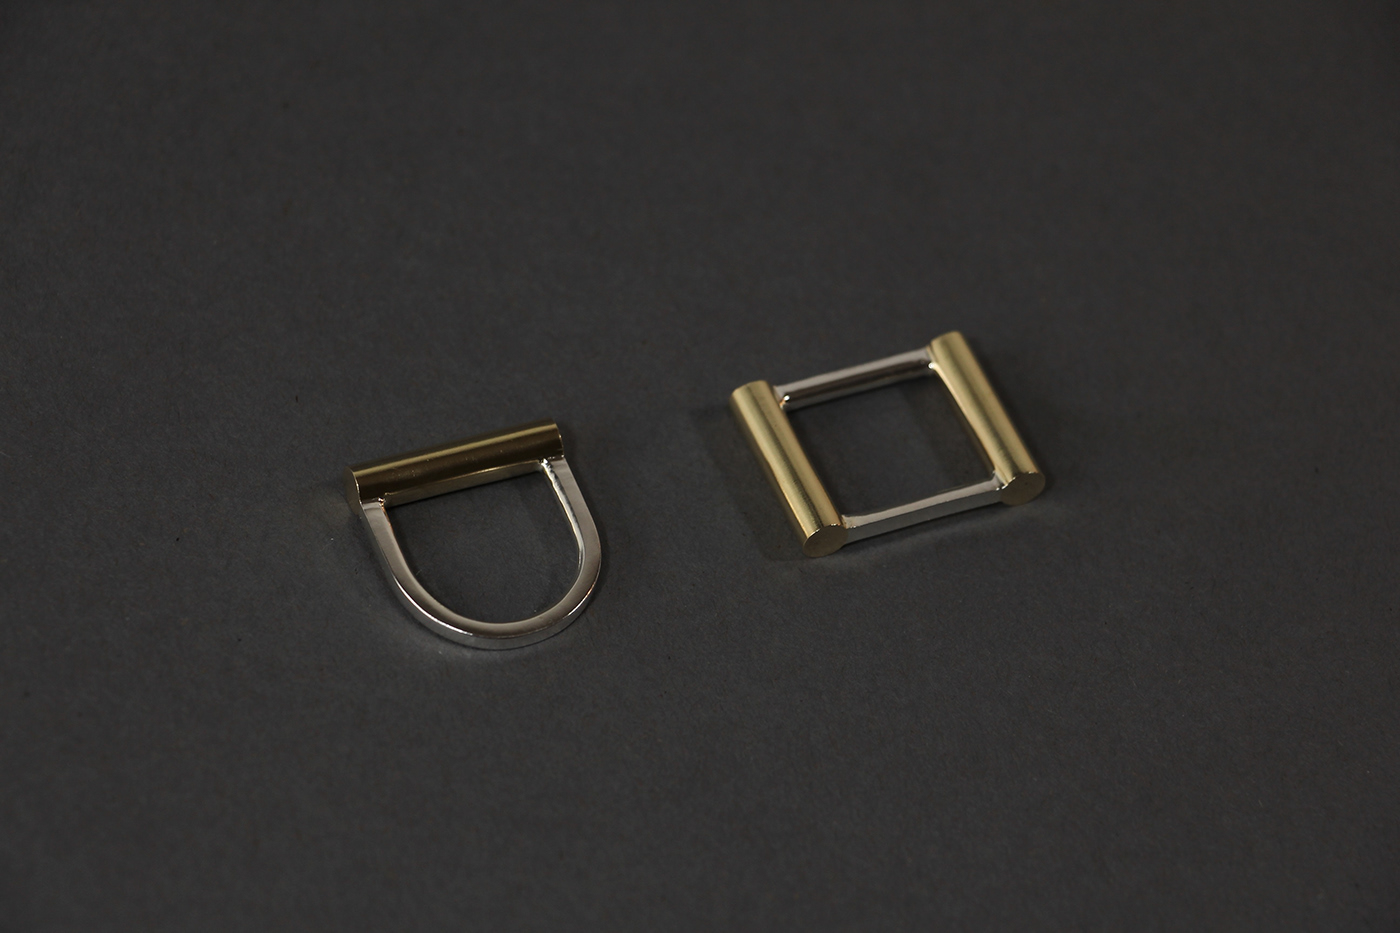 assembly brass craft design goldsmithing handmade jewel jewelry ring silver